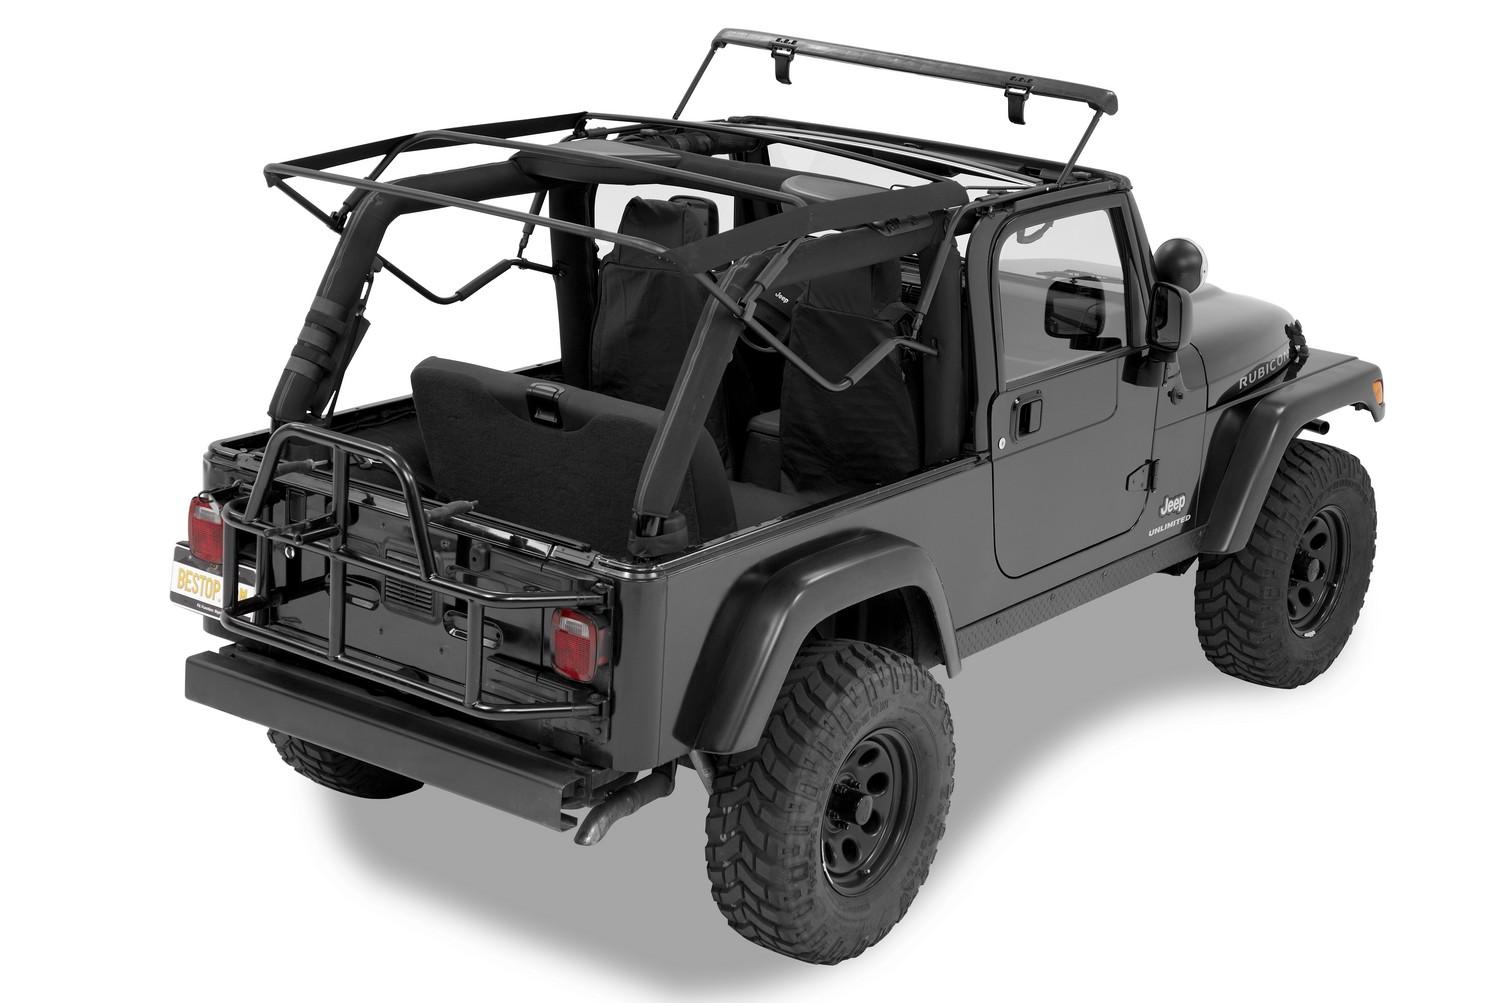 supertop nx twill negro jeep wrangler tj 97 06 54820 17 capota softtop ebay. Black Bedroom Furniture Sets. Home Design Ideas